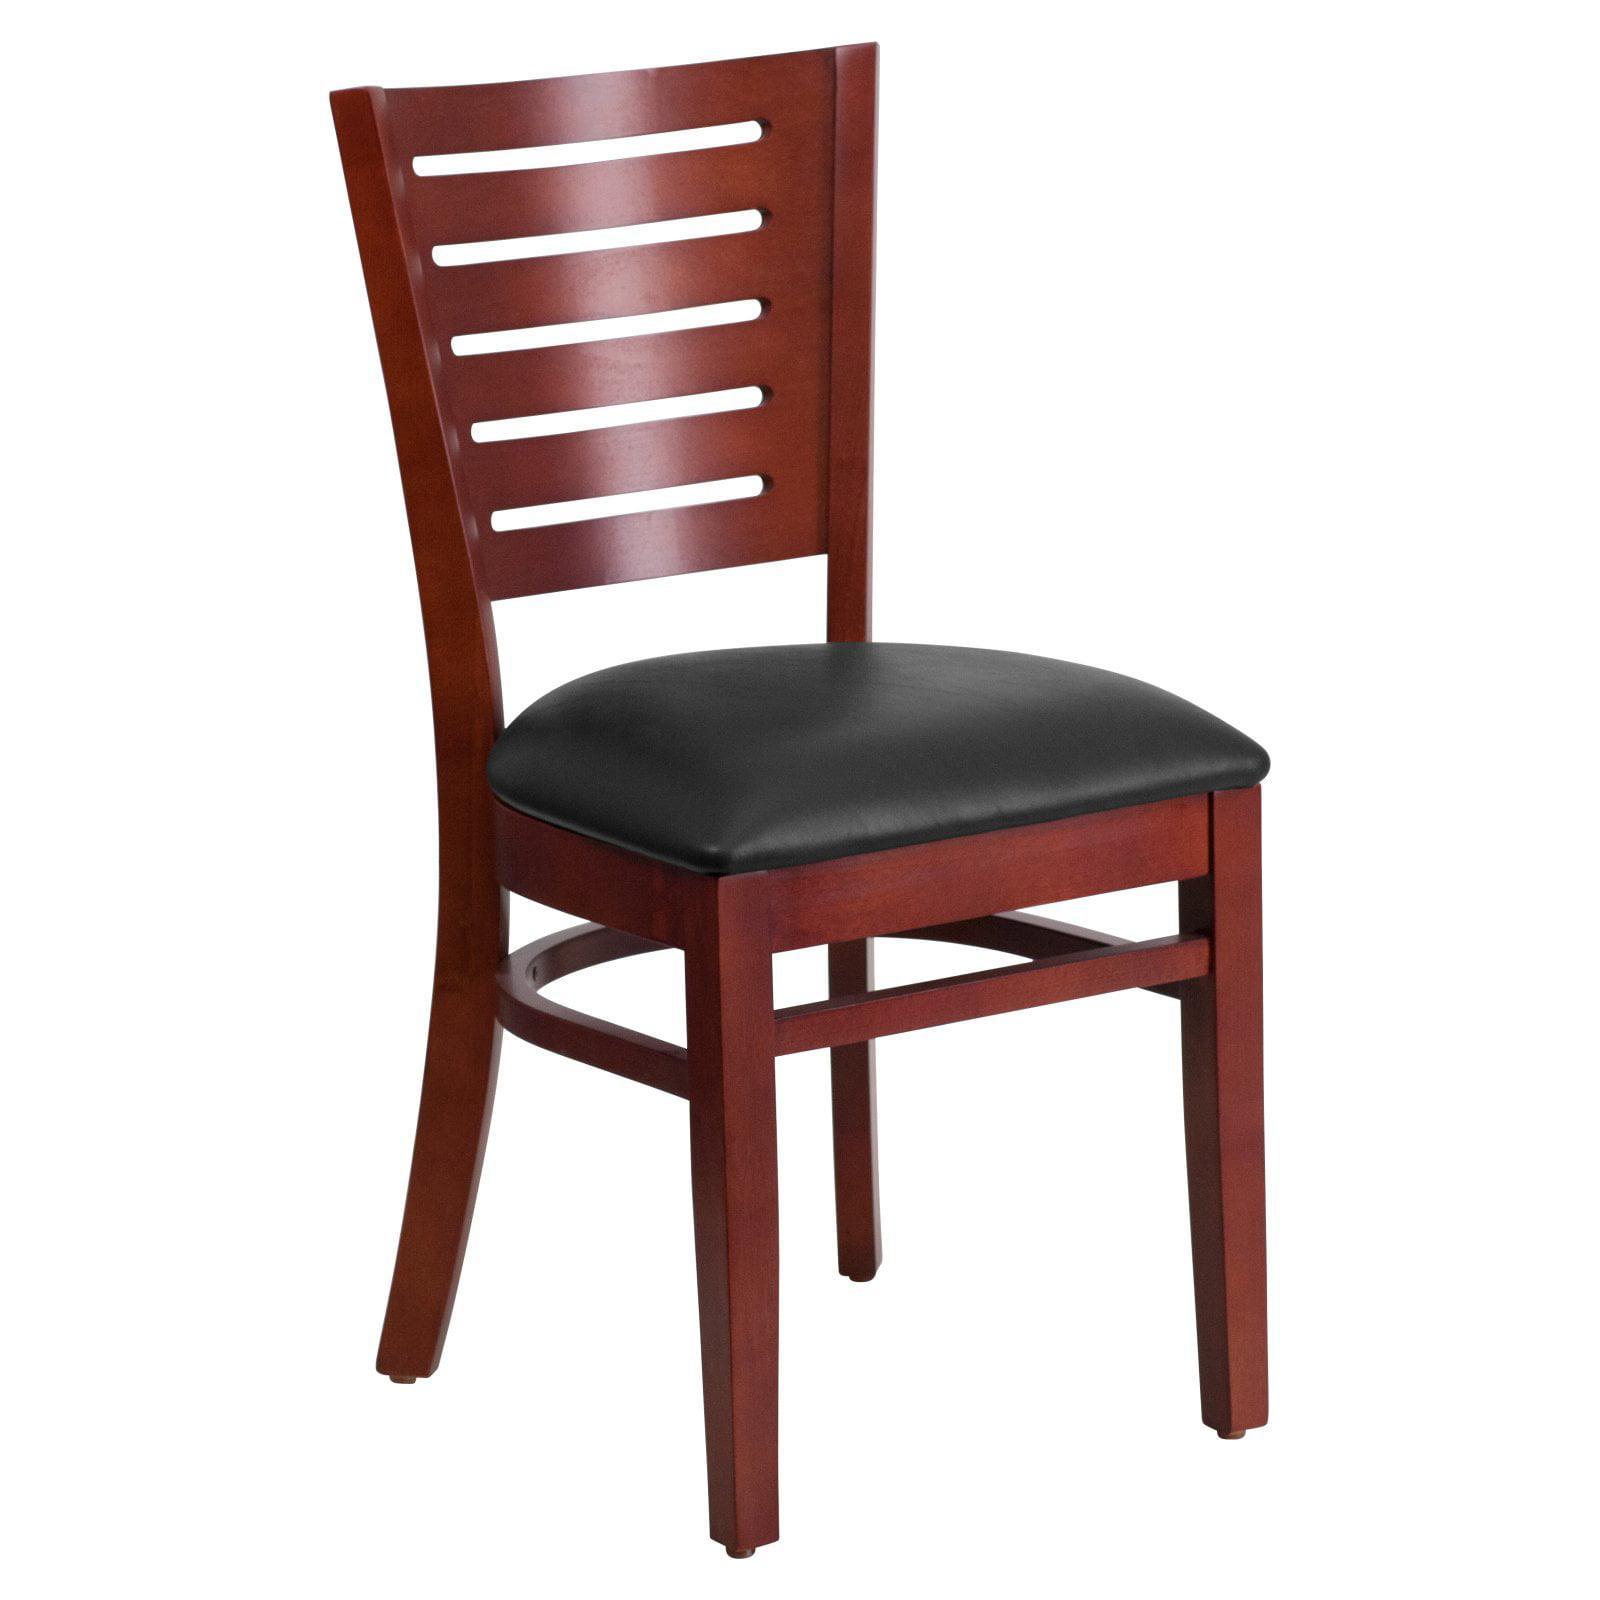 Flash Furniture Darby Series Slat Back Mahogany Wooden Restaurant Chair, Vinyl Seat, Multiple Colors